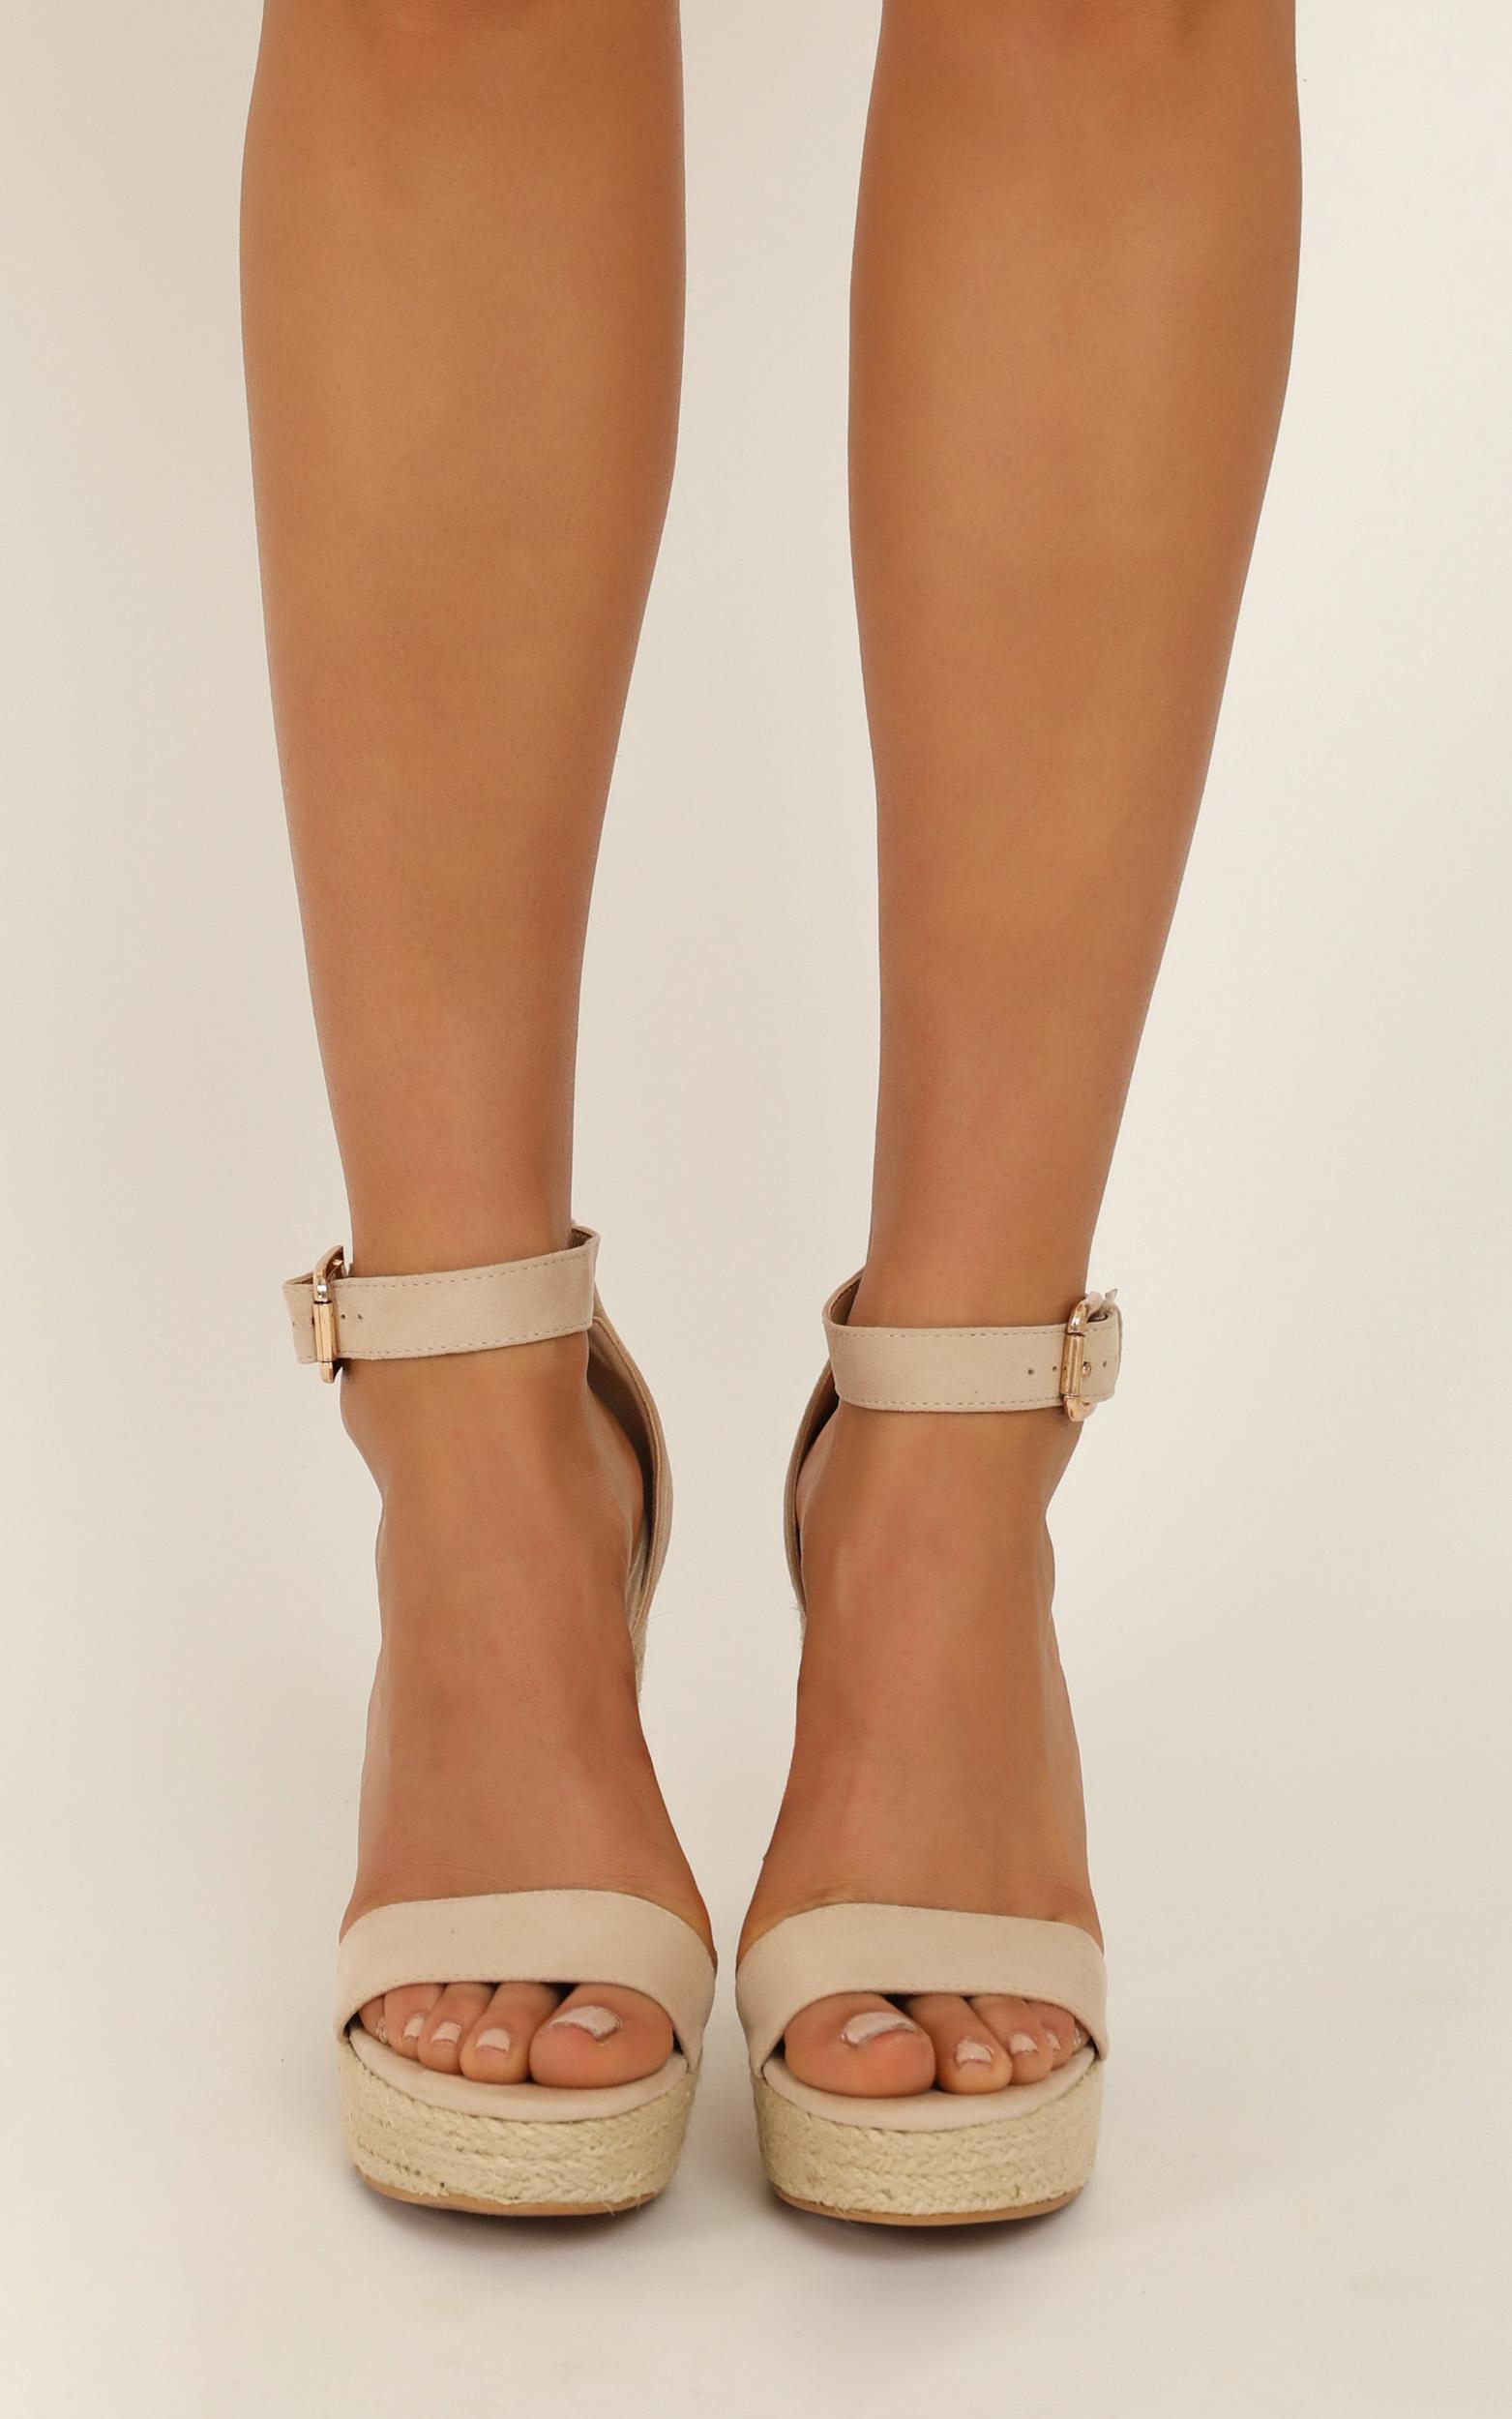 Billini - Evanna heels in nude micro - 10, Beige, hi-res image number null